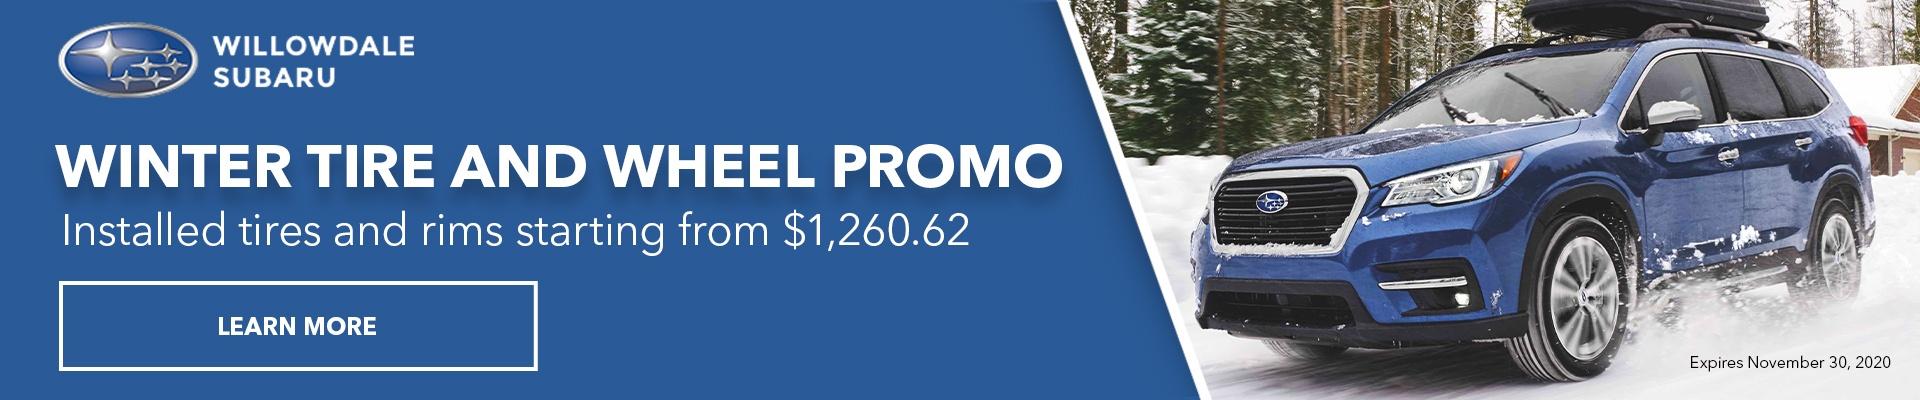 Wheel Promo